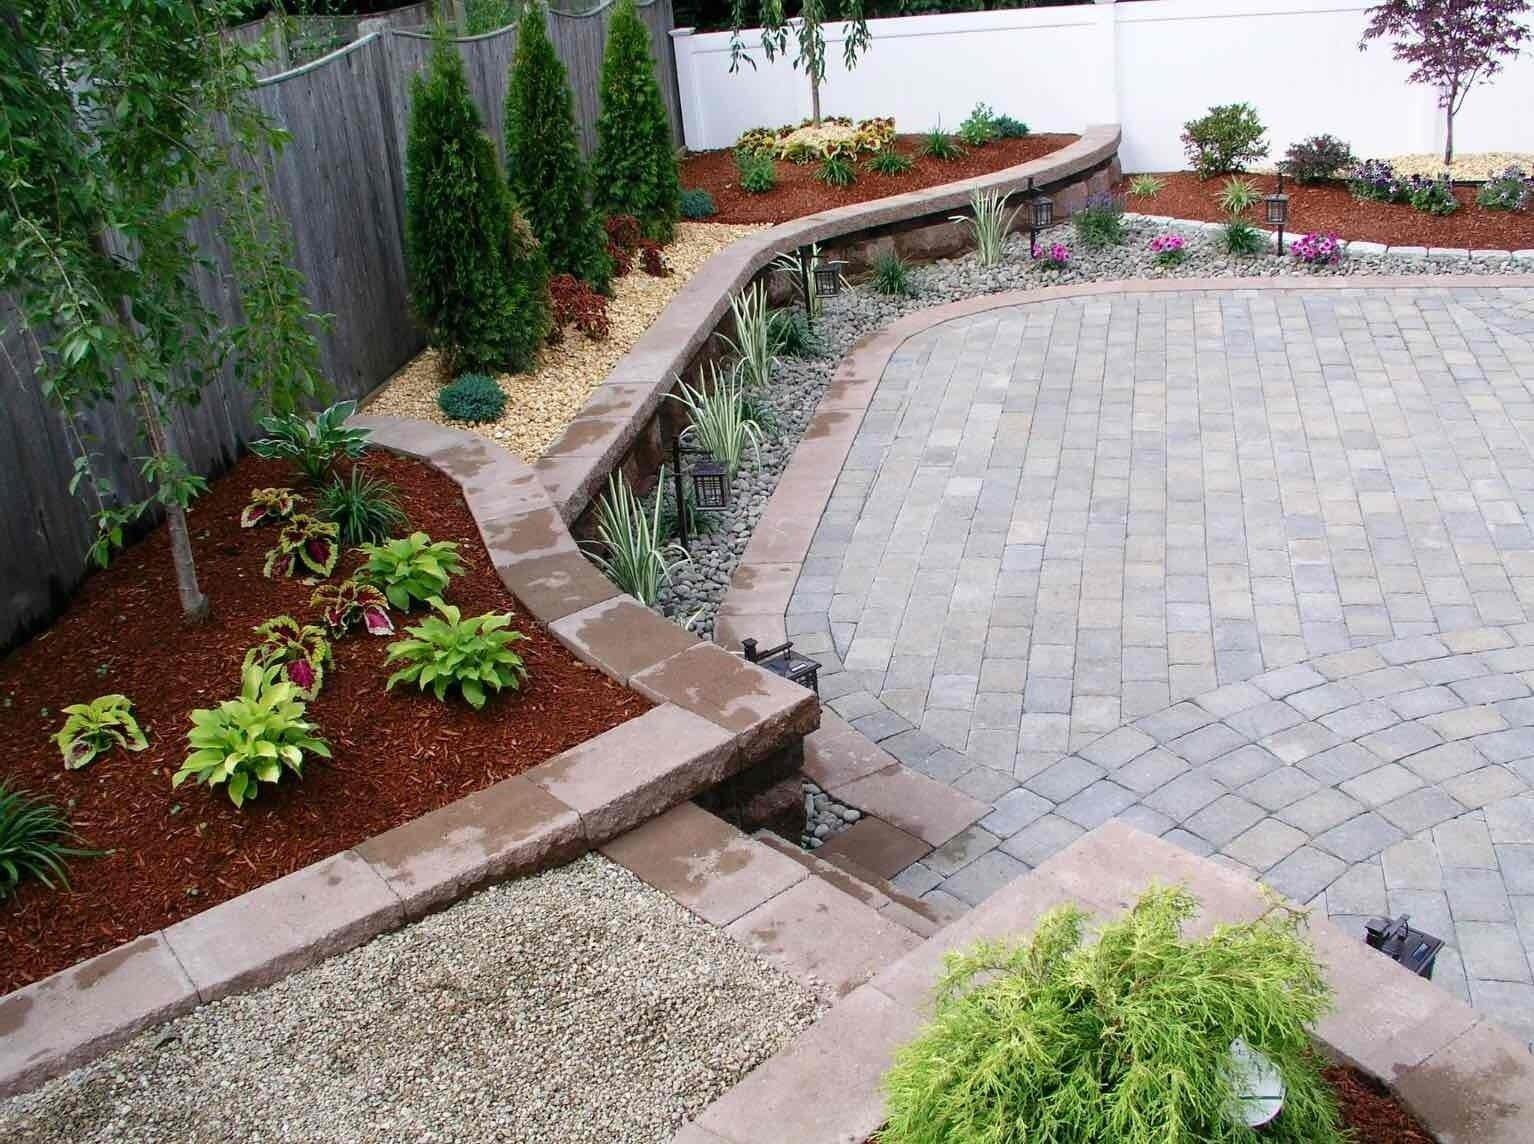 10 Attractive Low Maintenance Backyard Landscaping Ideas 2019